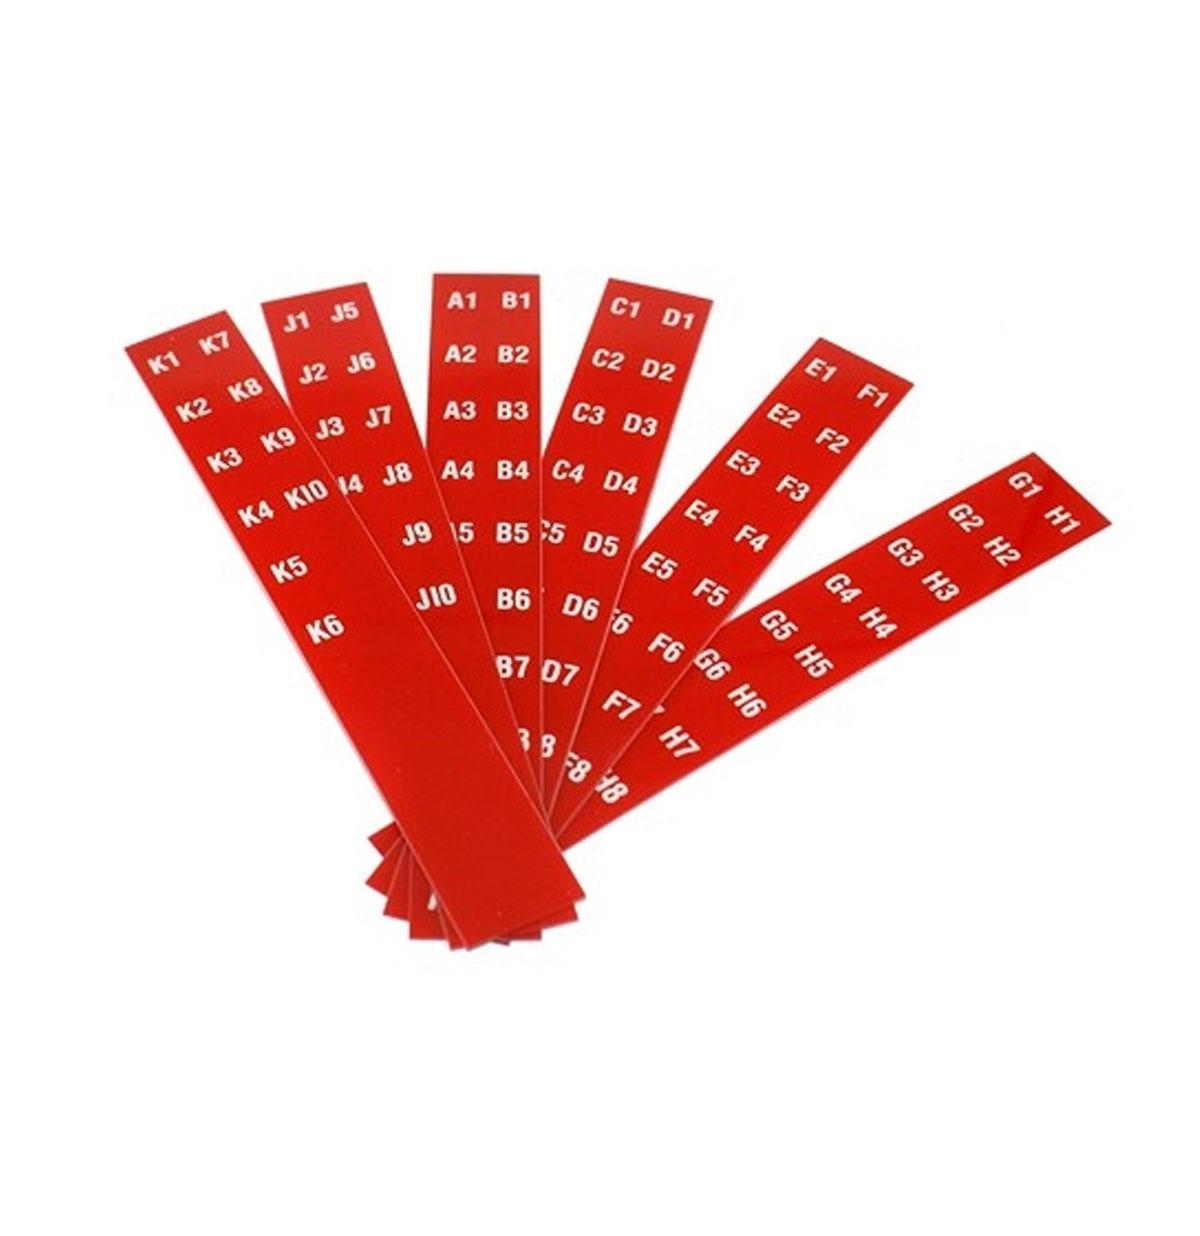 Seeburg Letters / Nummers in titelstrip houders (rood) Jukebox Model 100B